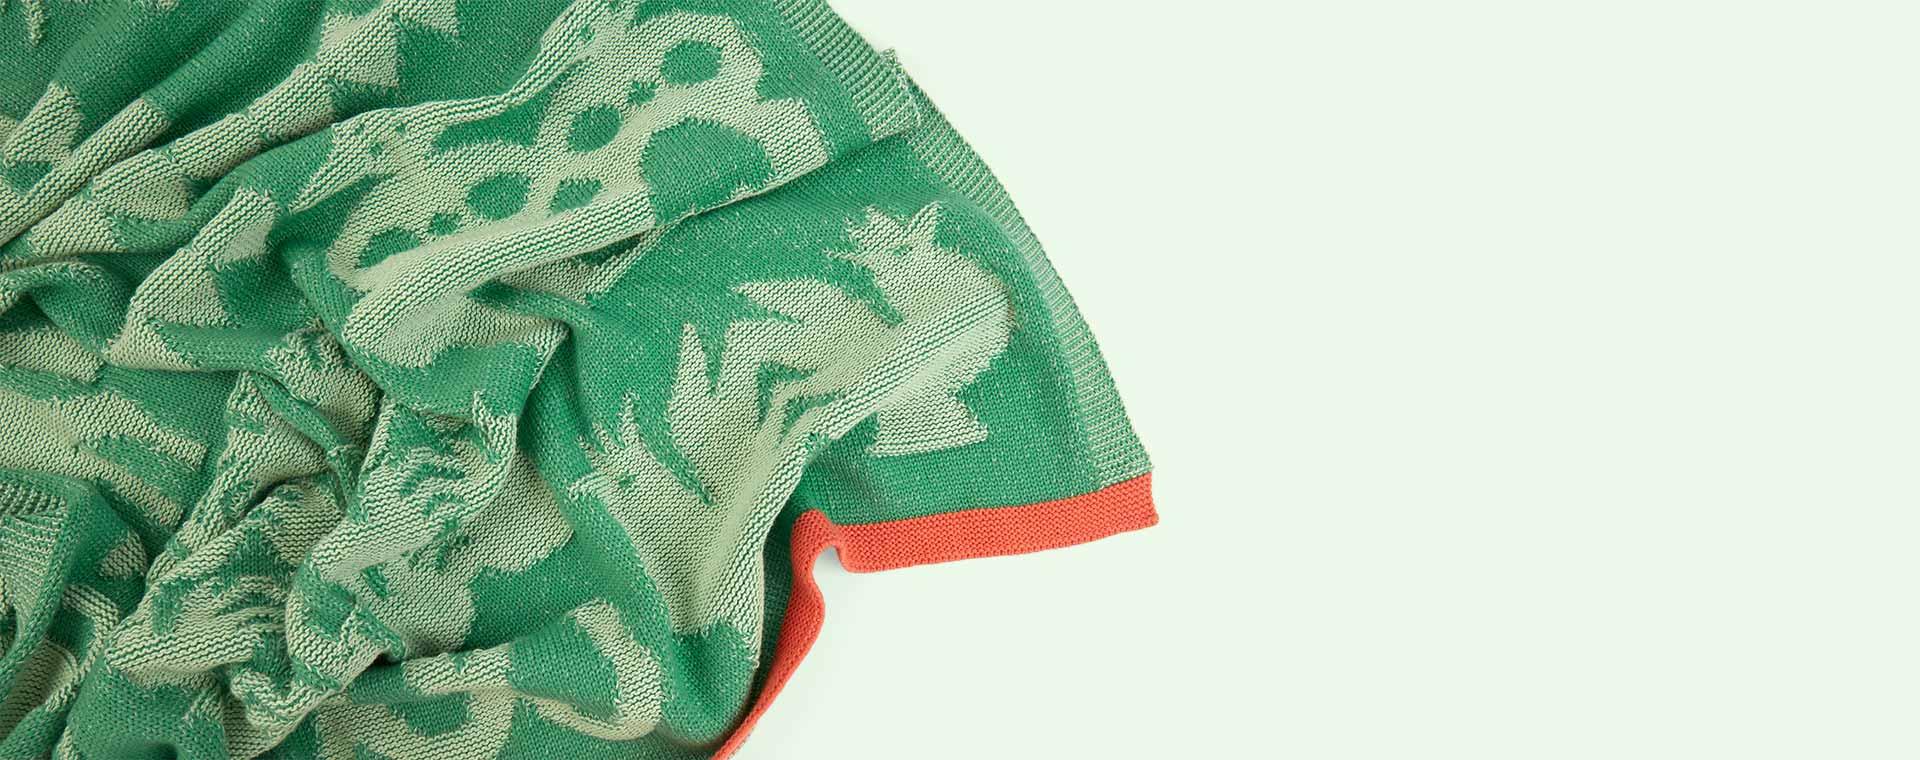 Apple Green Playroom Interiors Blanket